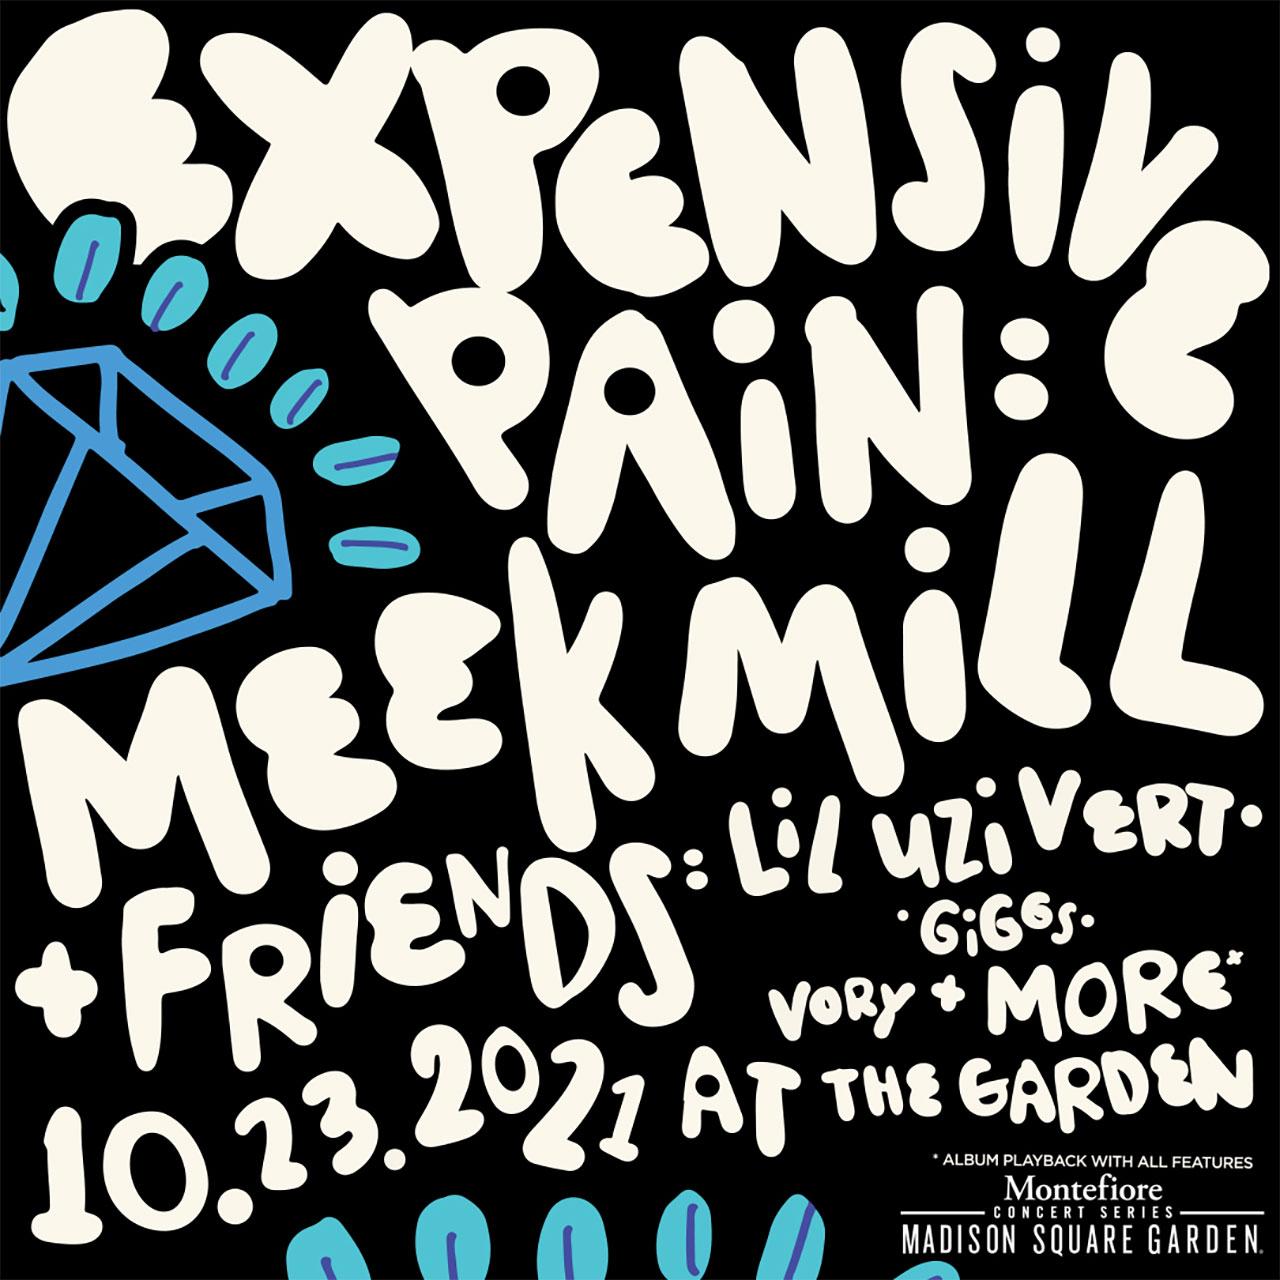 Meek Mill & Friends